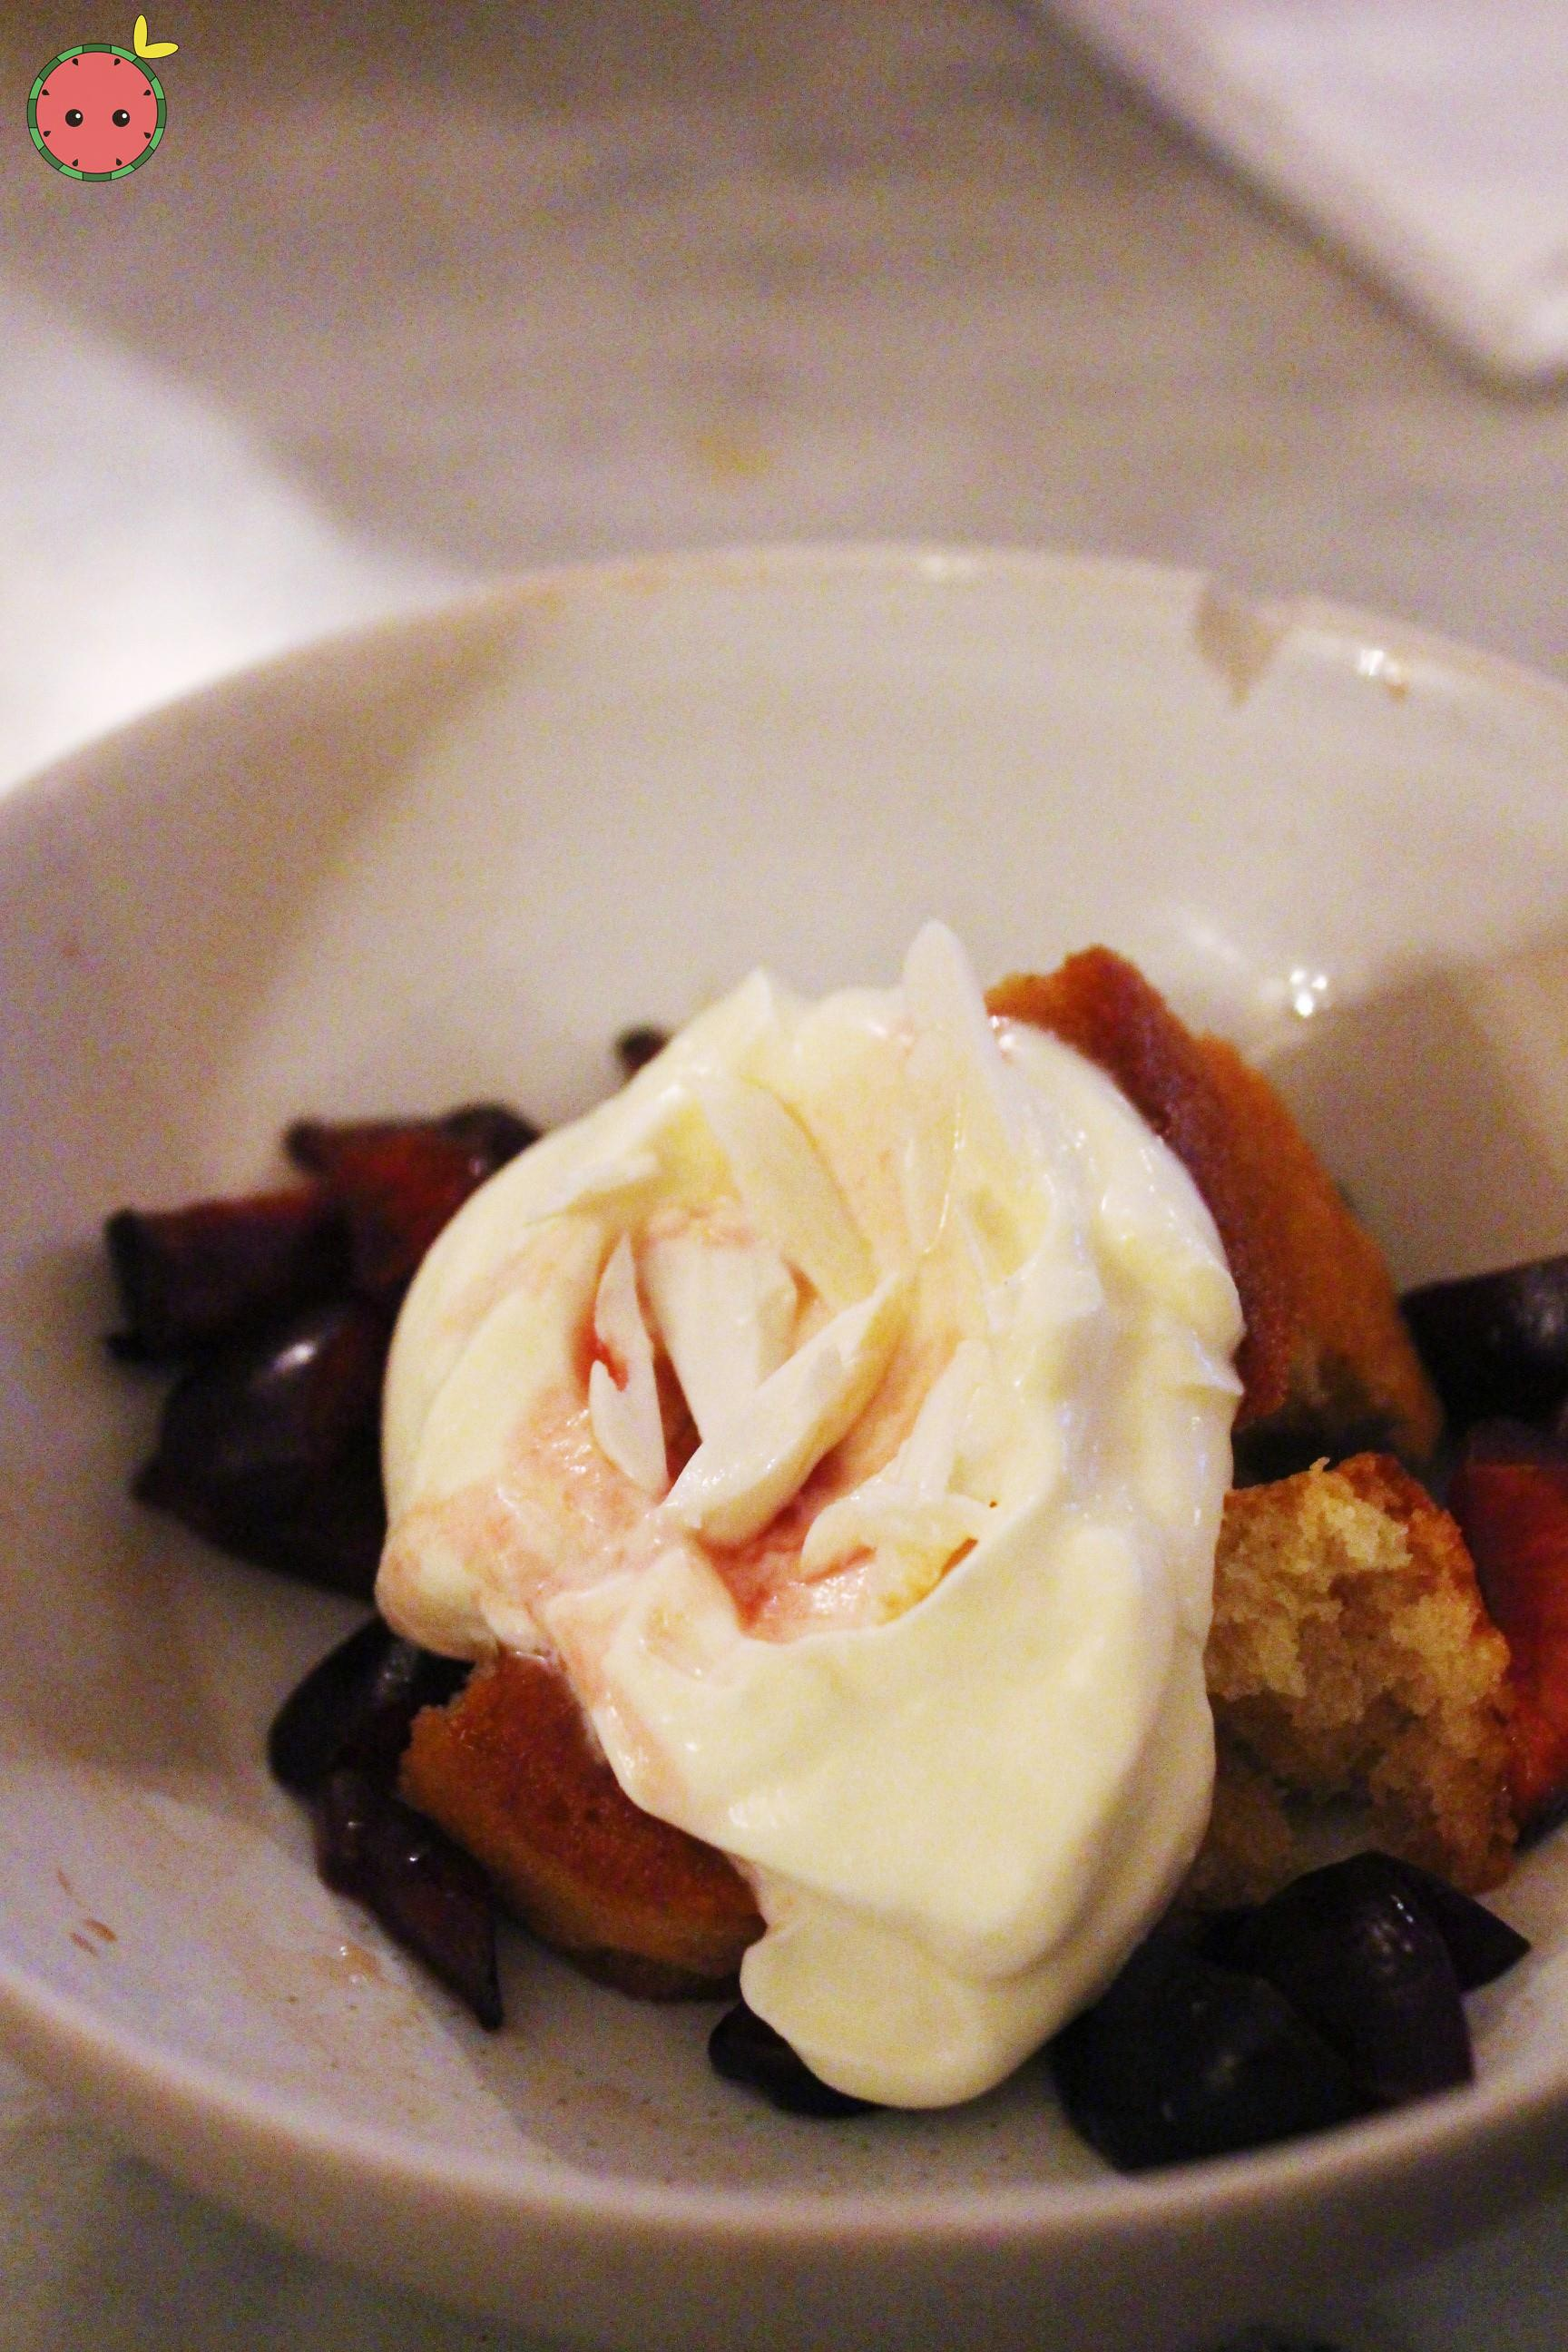 Almond cake, cherries, mascarpone, fresh almonds